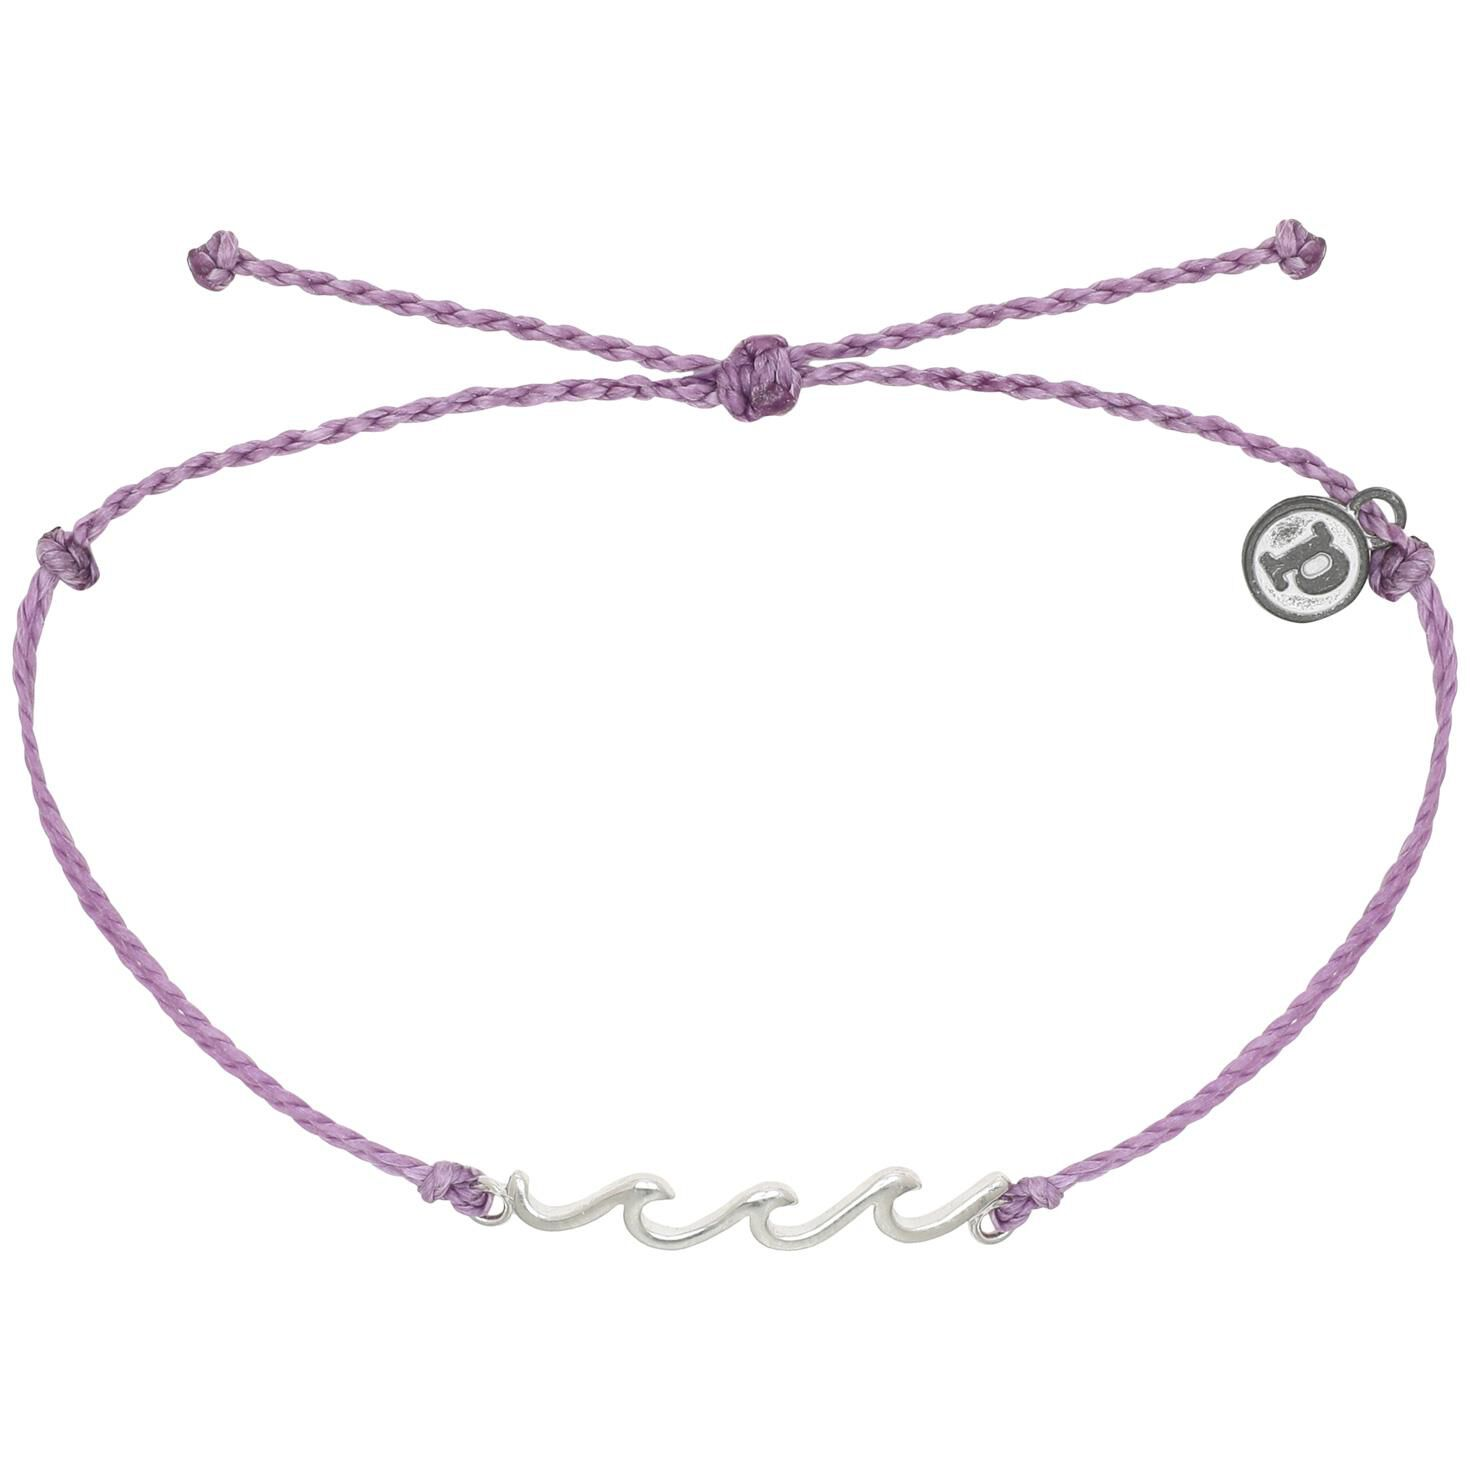 Delicate Waves Charm Bracelet